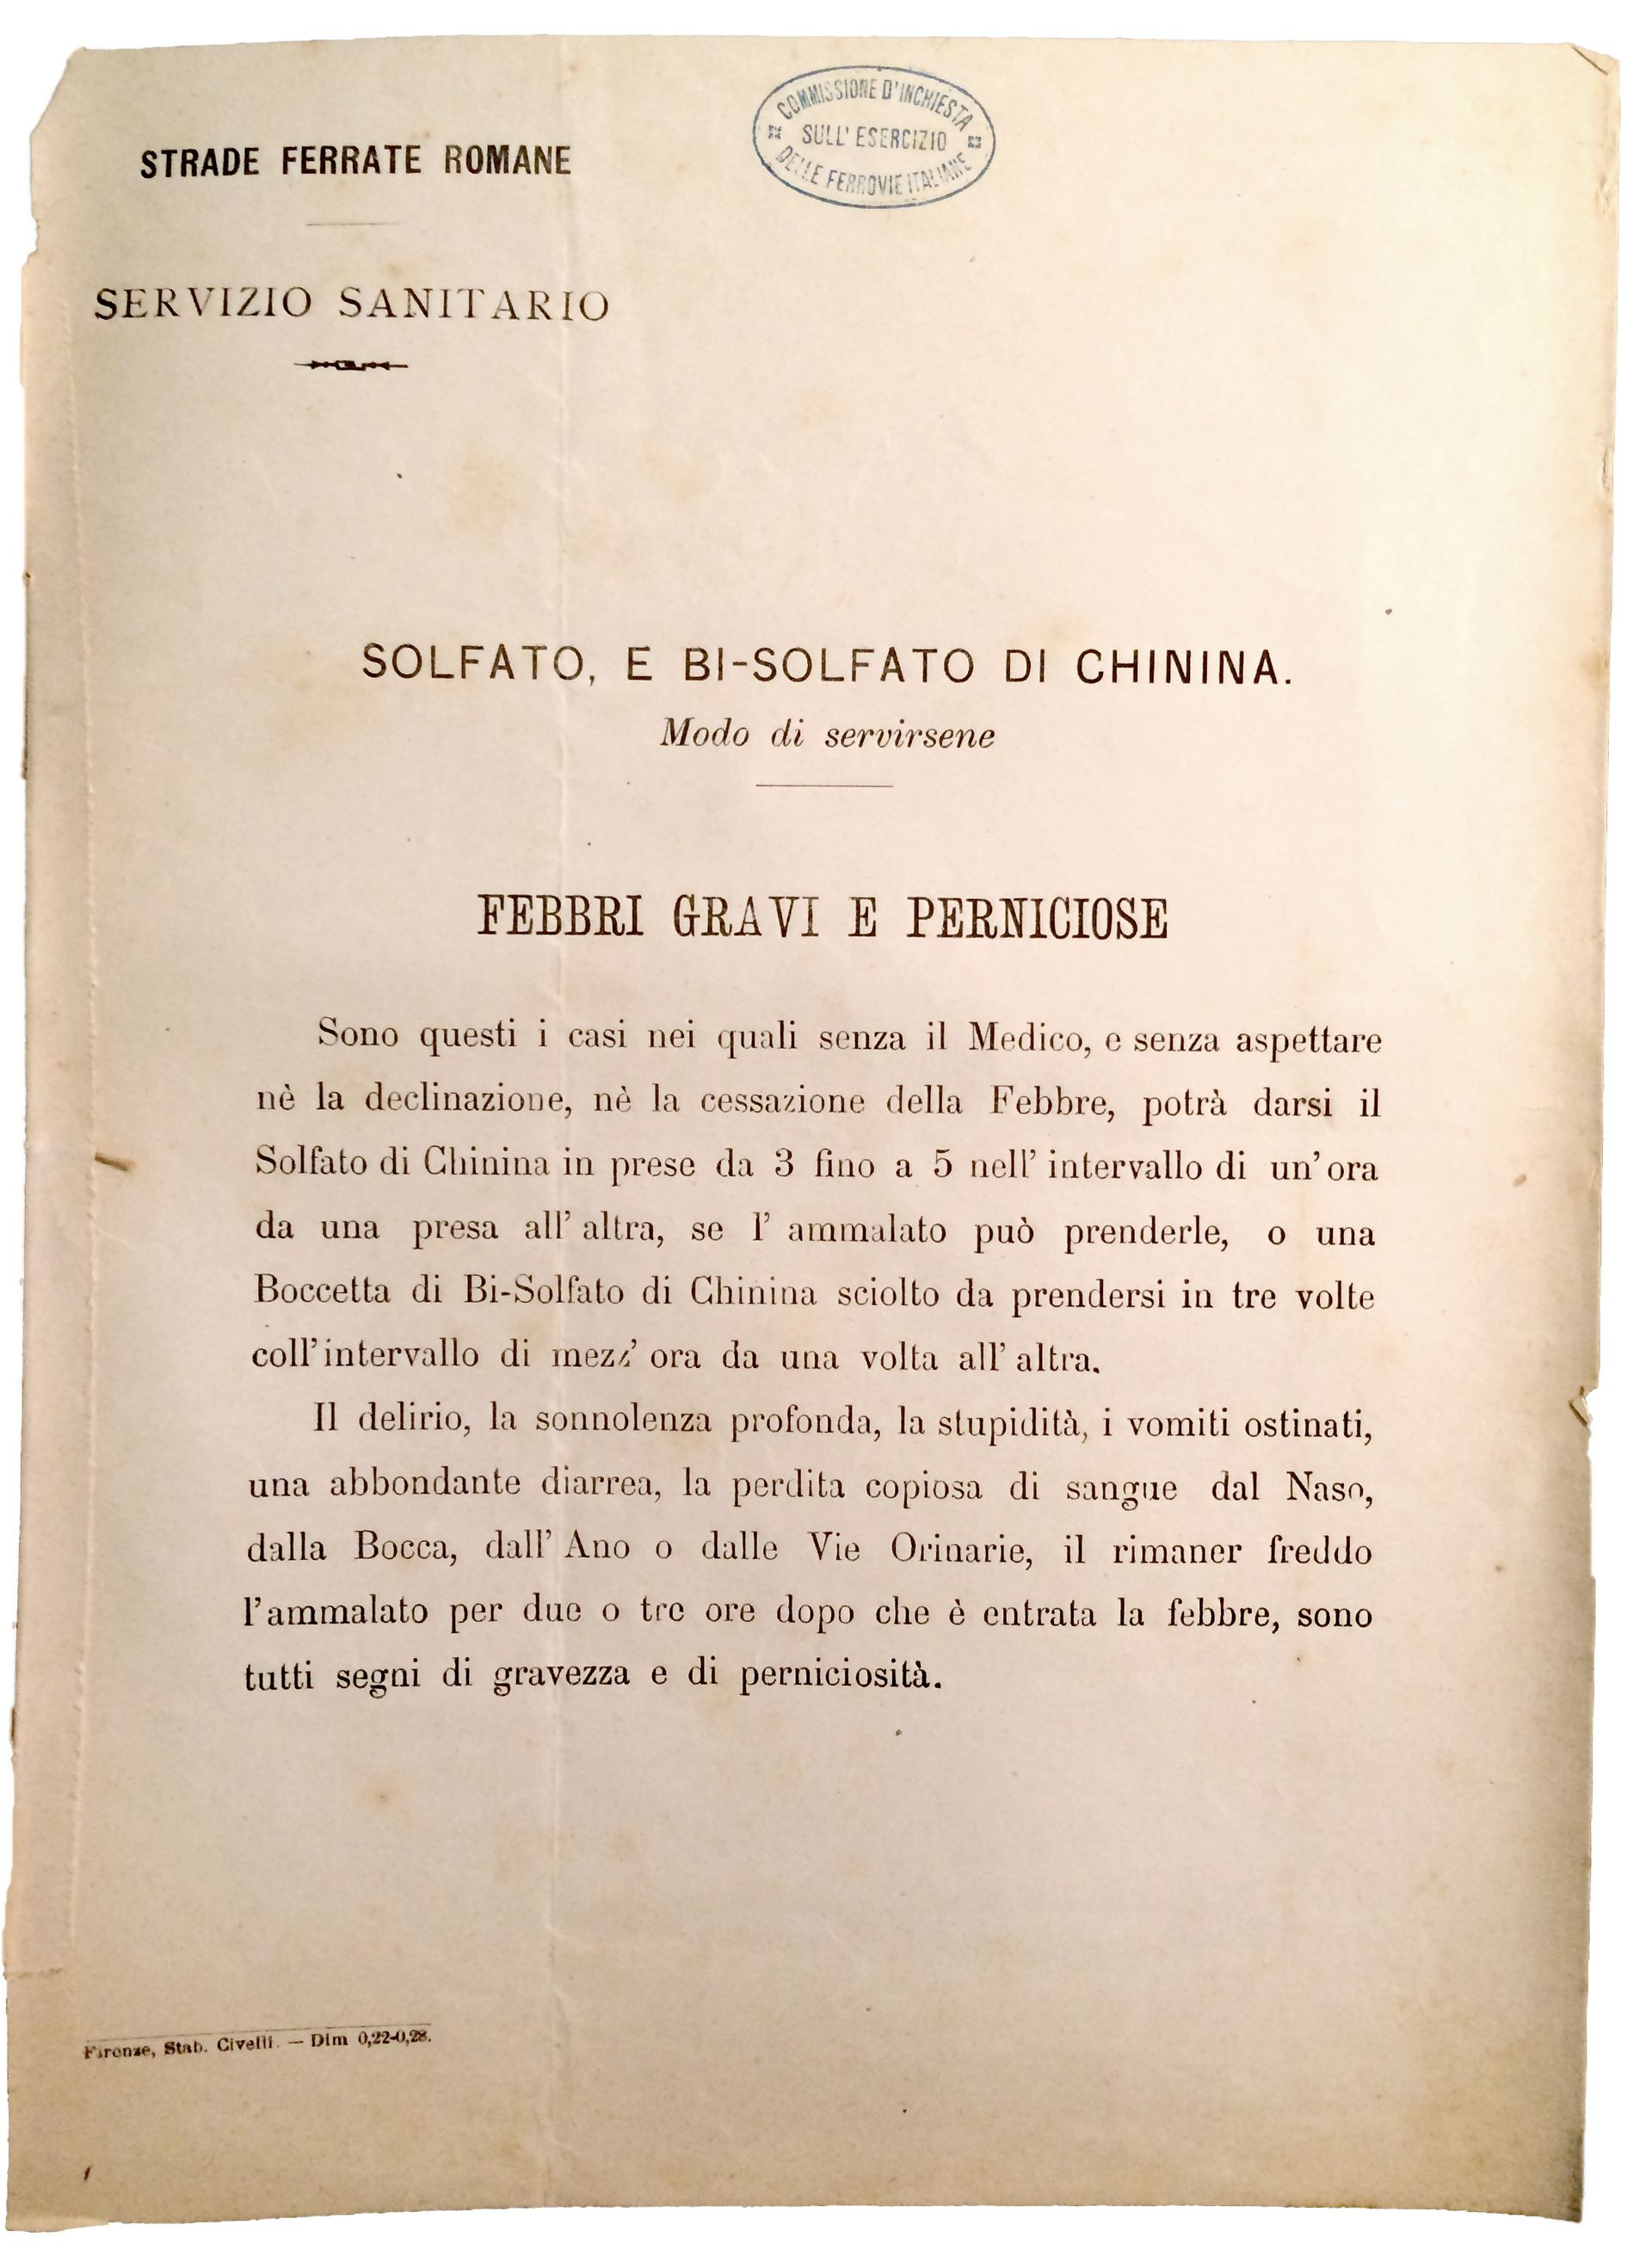 Mapping Malaria in Italy